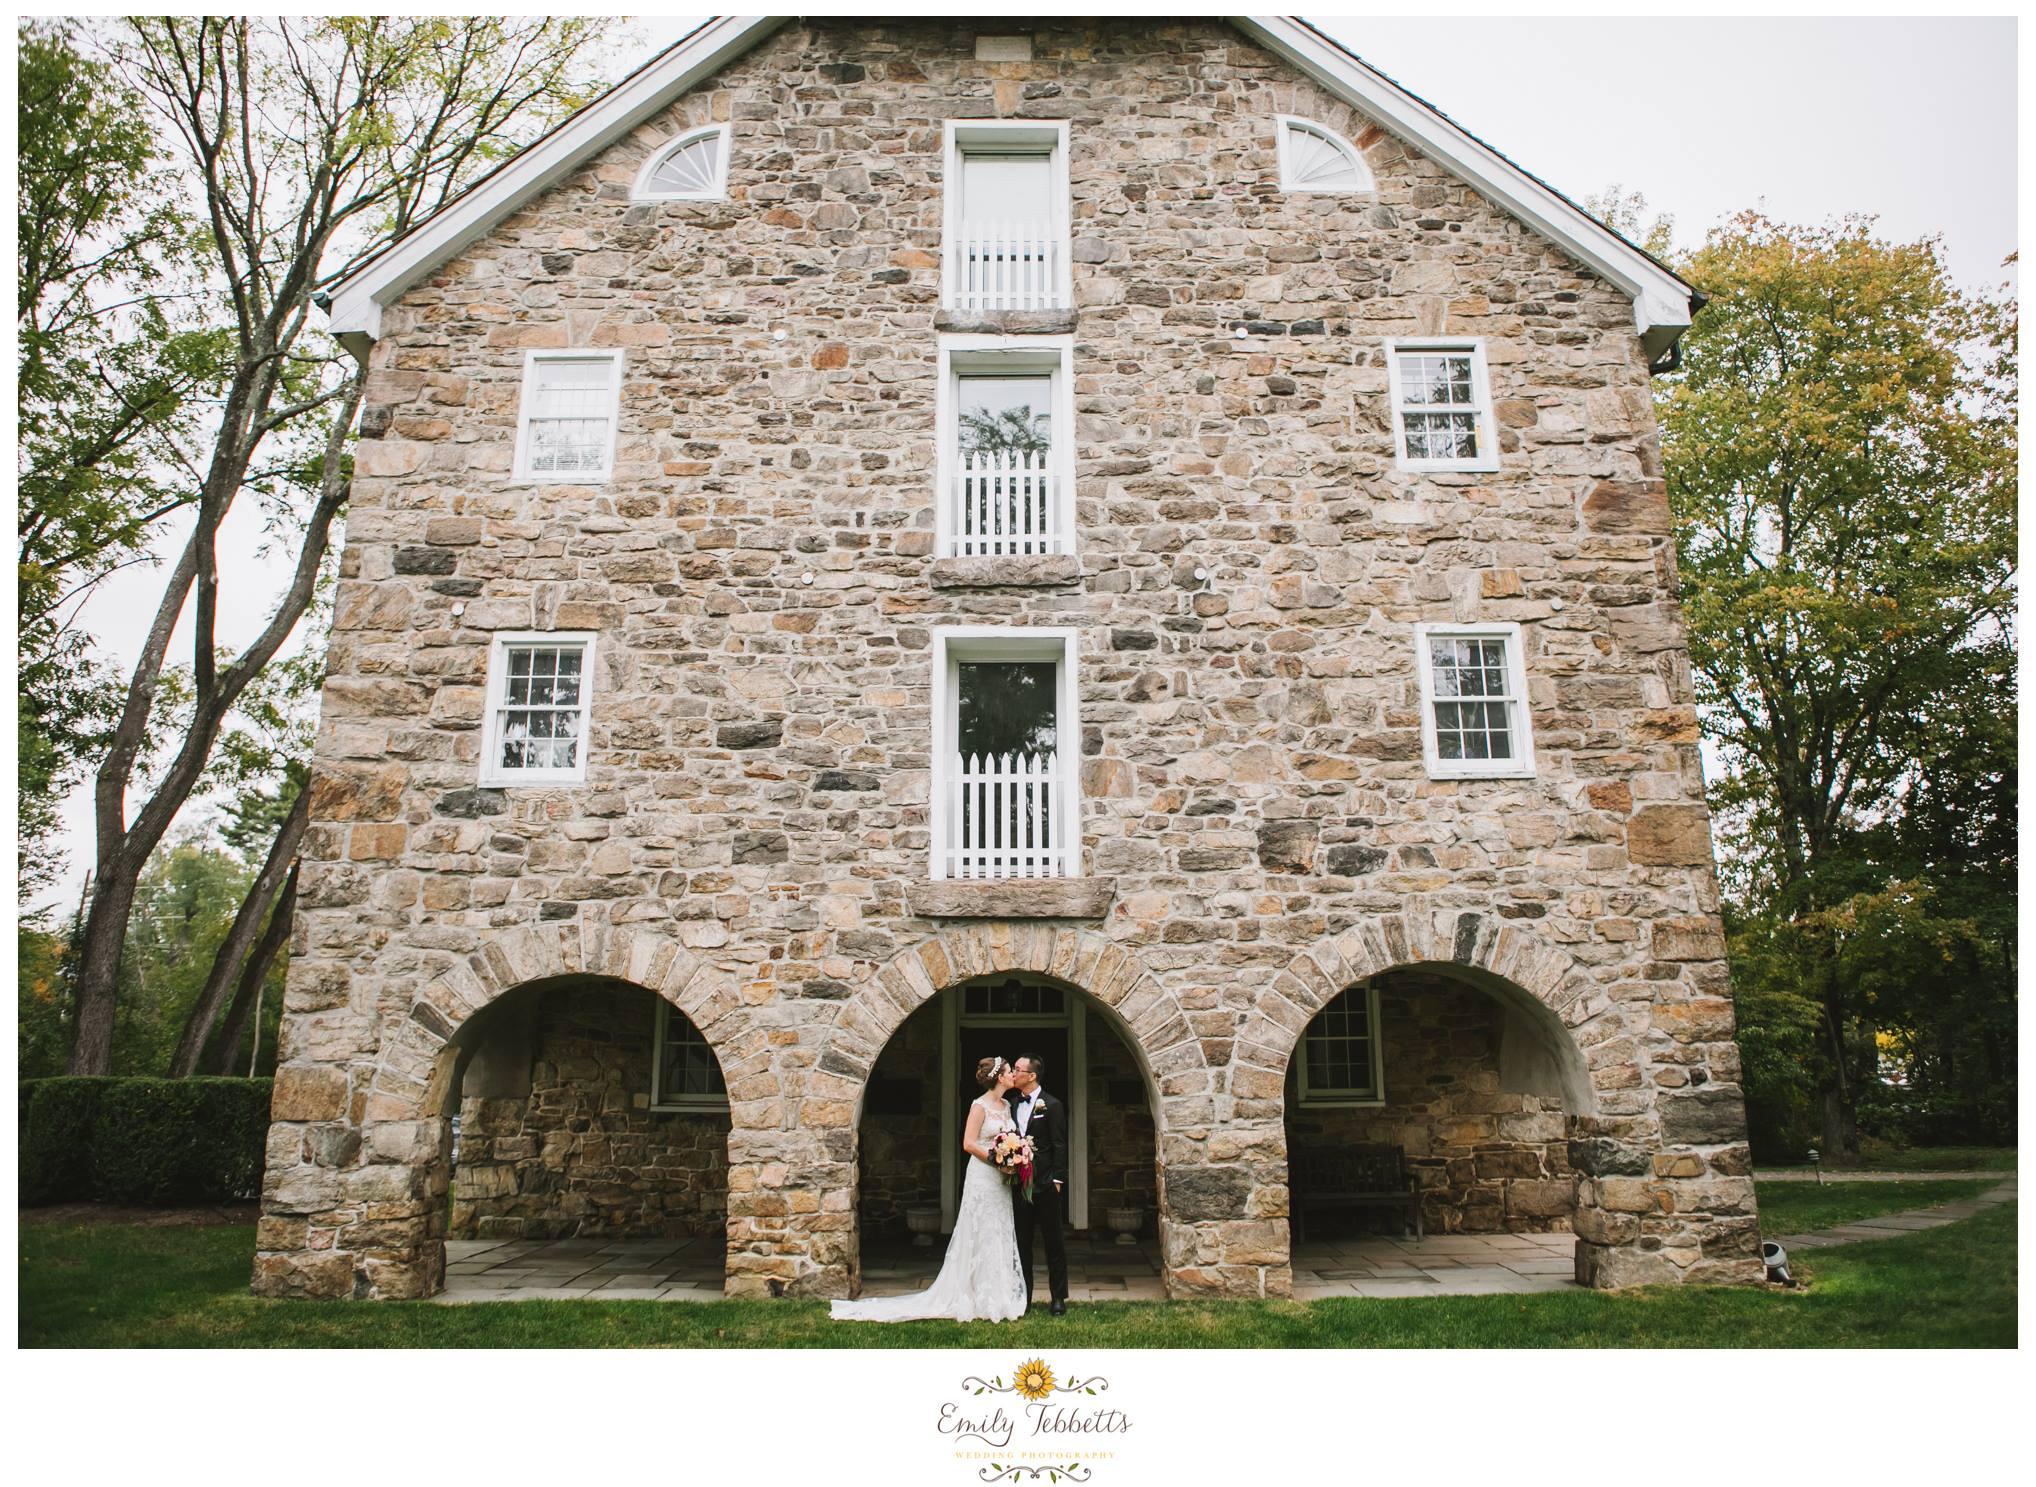 Basking Ridge, NJ - Emily Tebbetts Wedding Photography 2.jpg